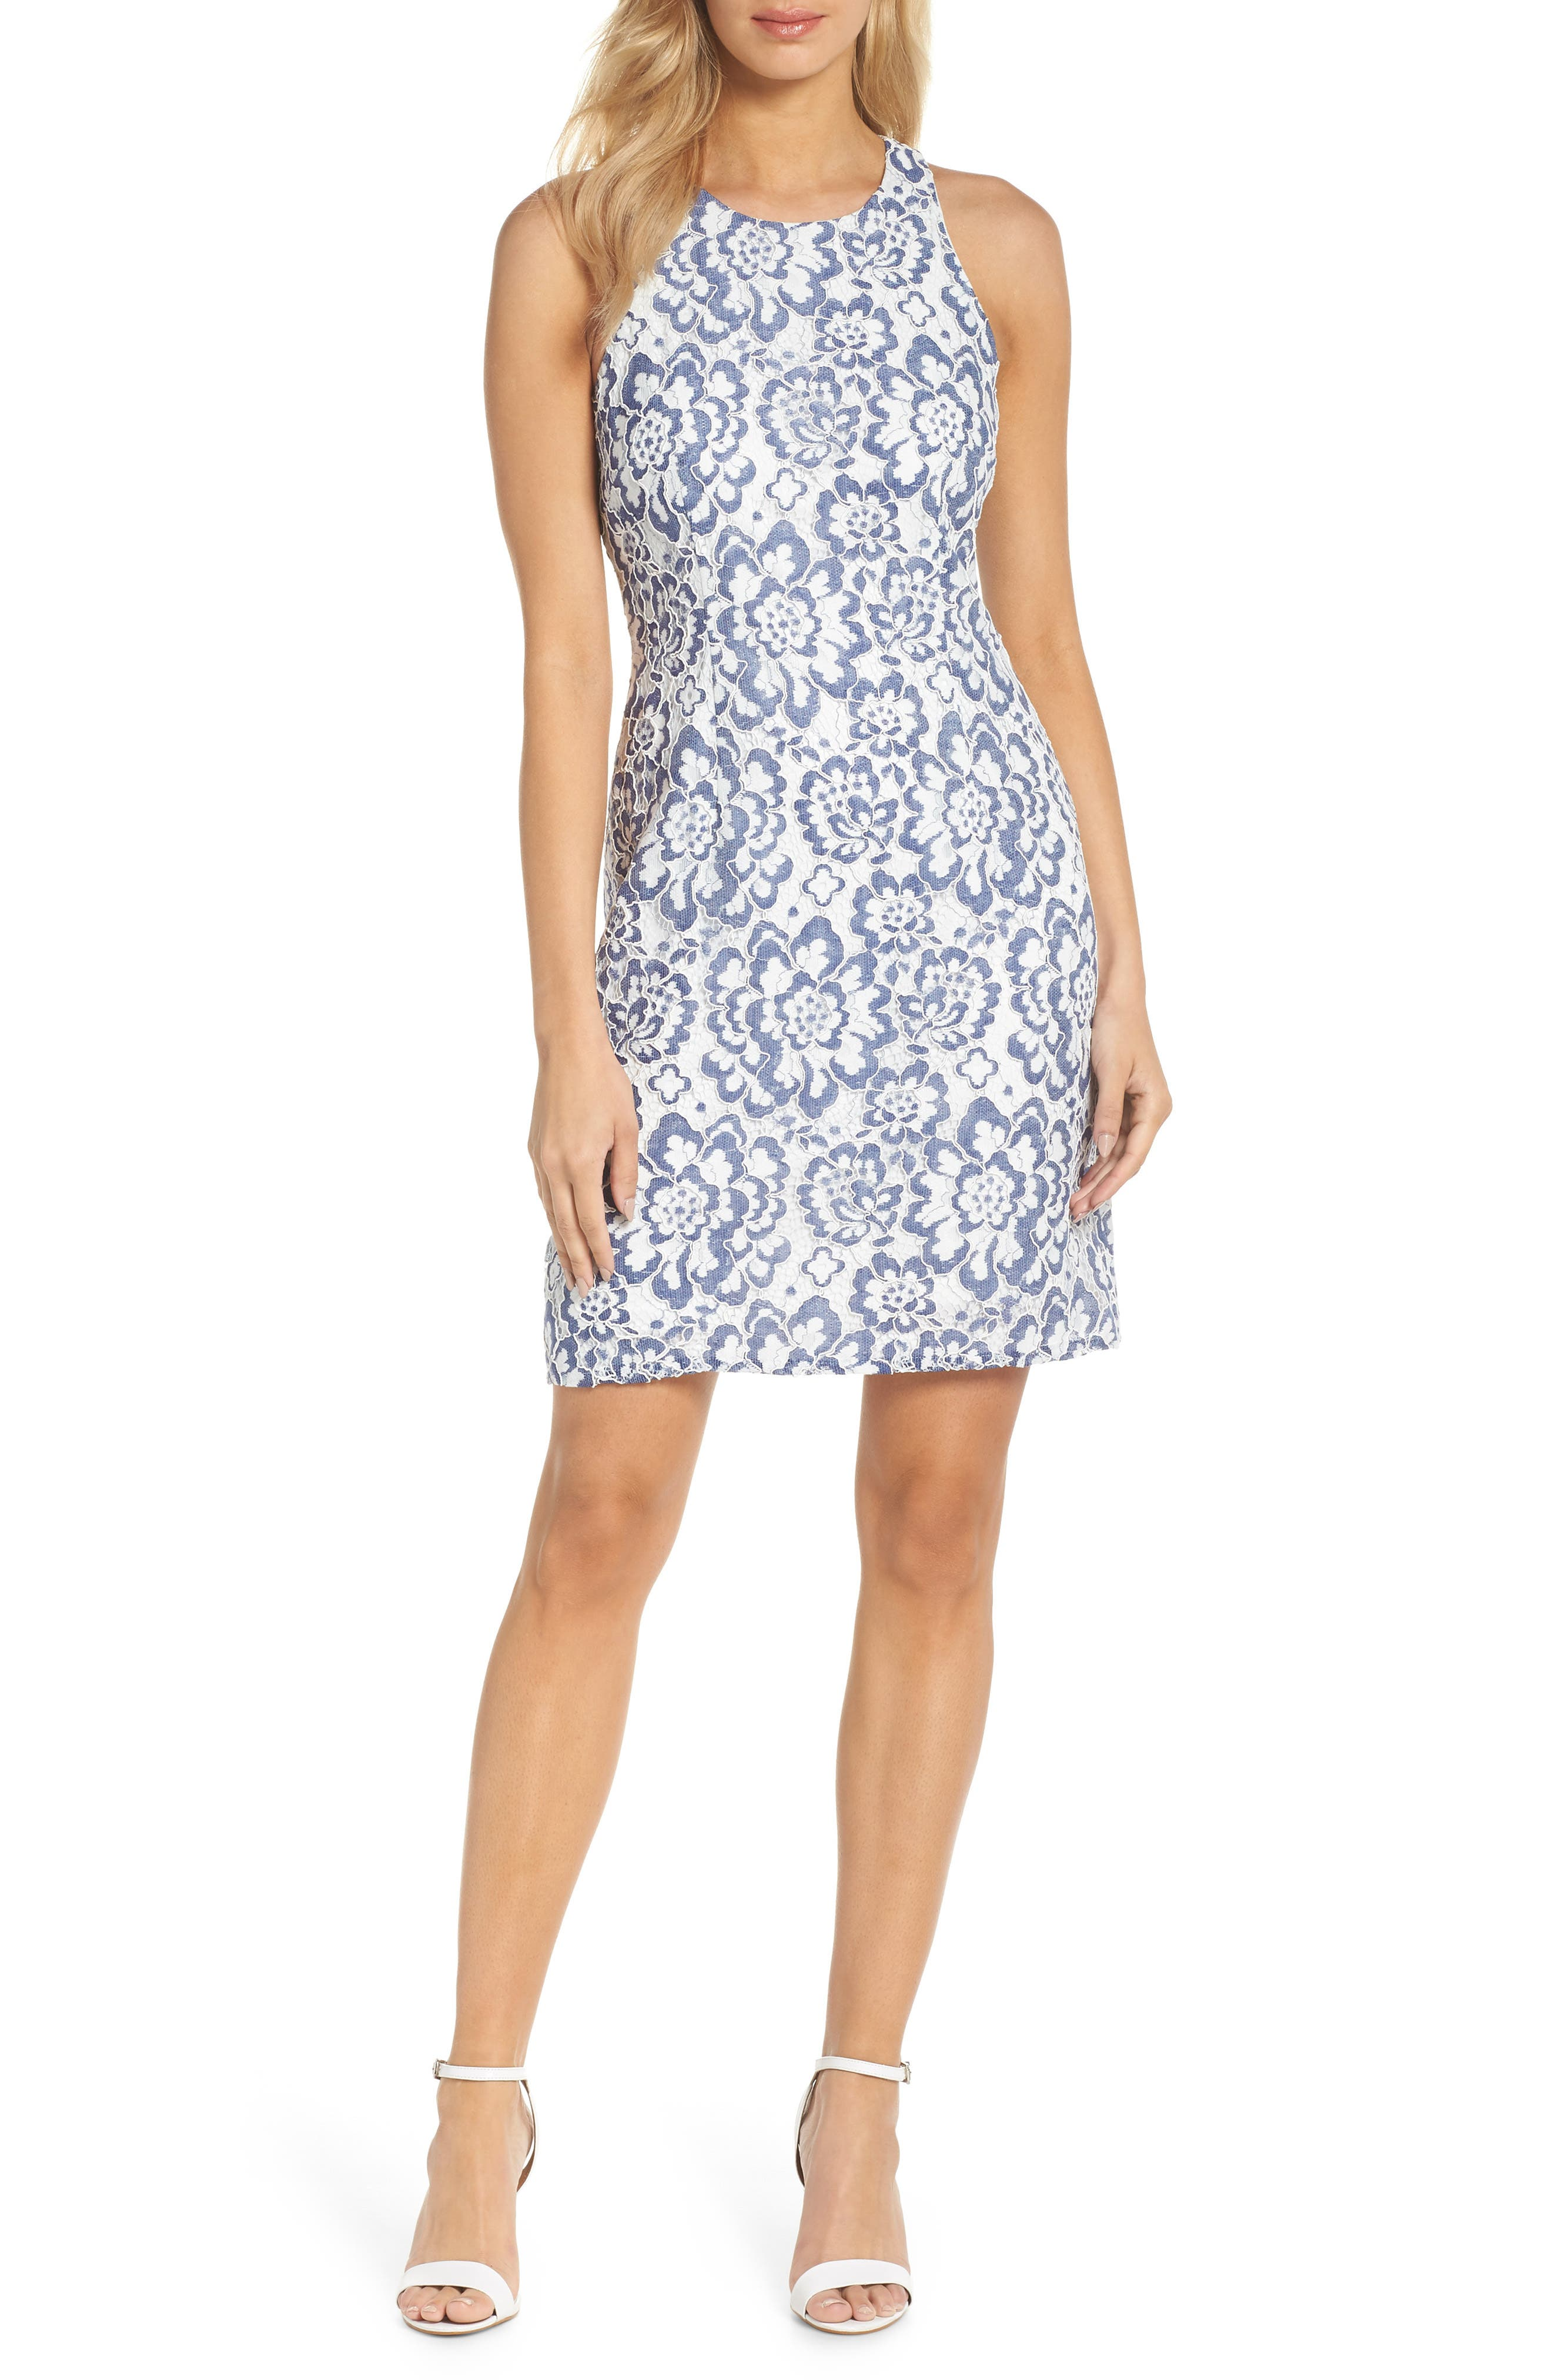 ADRIANNA PAPELL,                             Elisa Two Tone Lace Sheath Dress,                             Main thumbnail 1, color,                             481